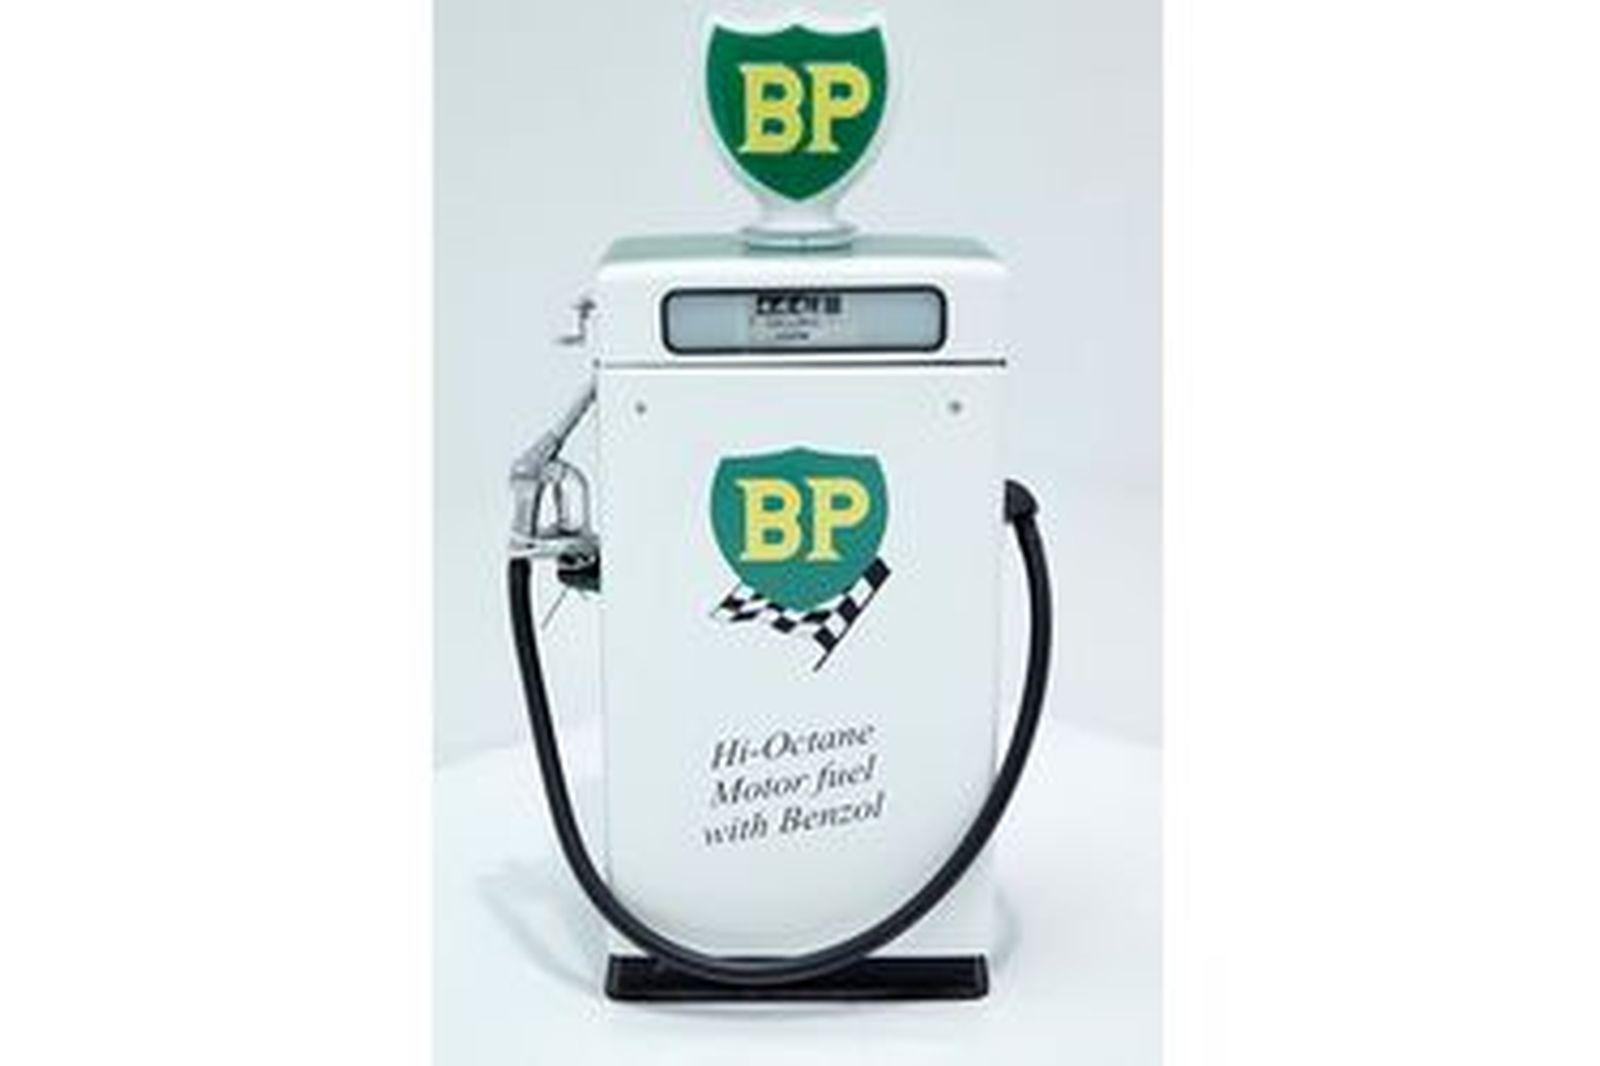 Petrol Pump - Wayne 605 Industrial in BP Racing Livery with Reproduction Globe (Restored)